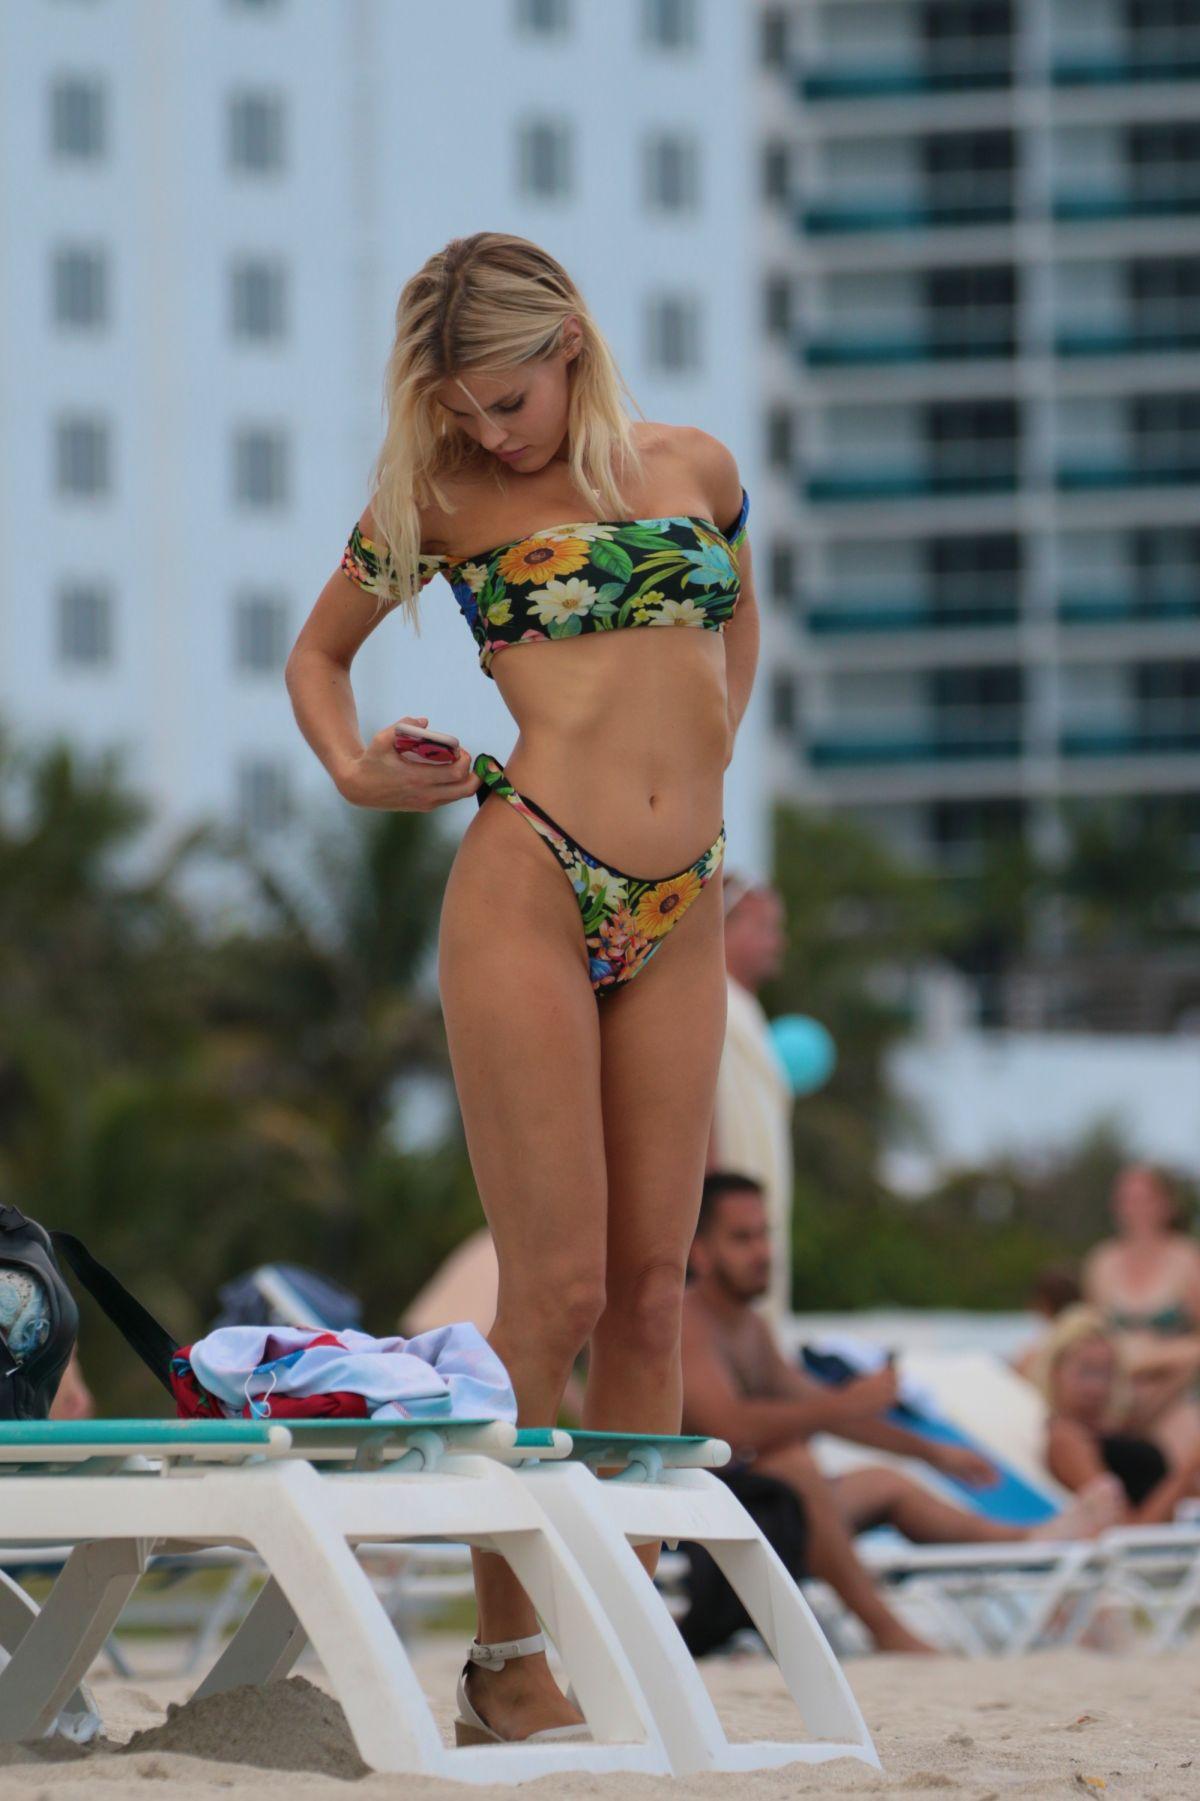 Bikini The Frappening naked (94 photo), Topless, Bikini, Selfie, swimsuit 2020